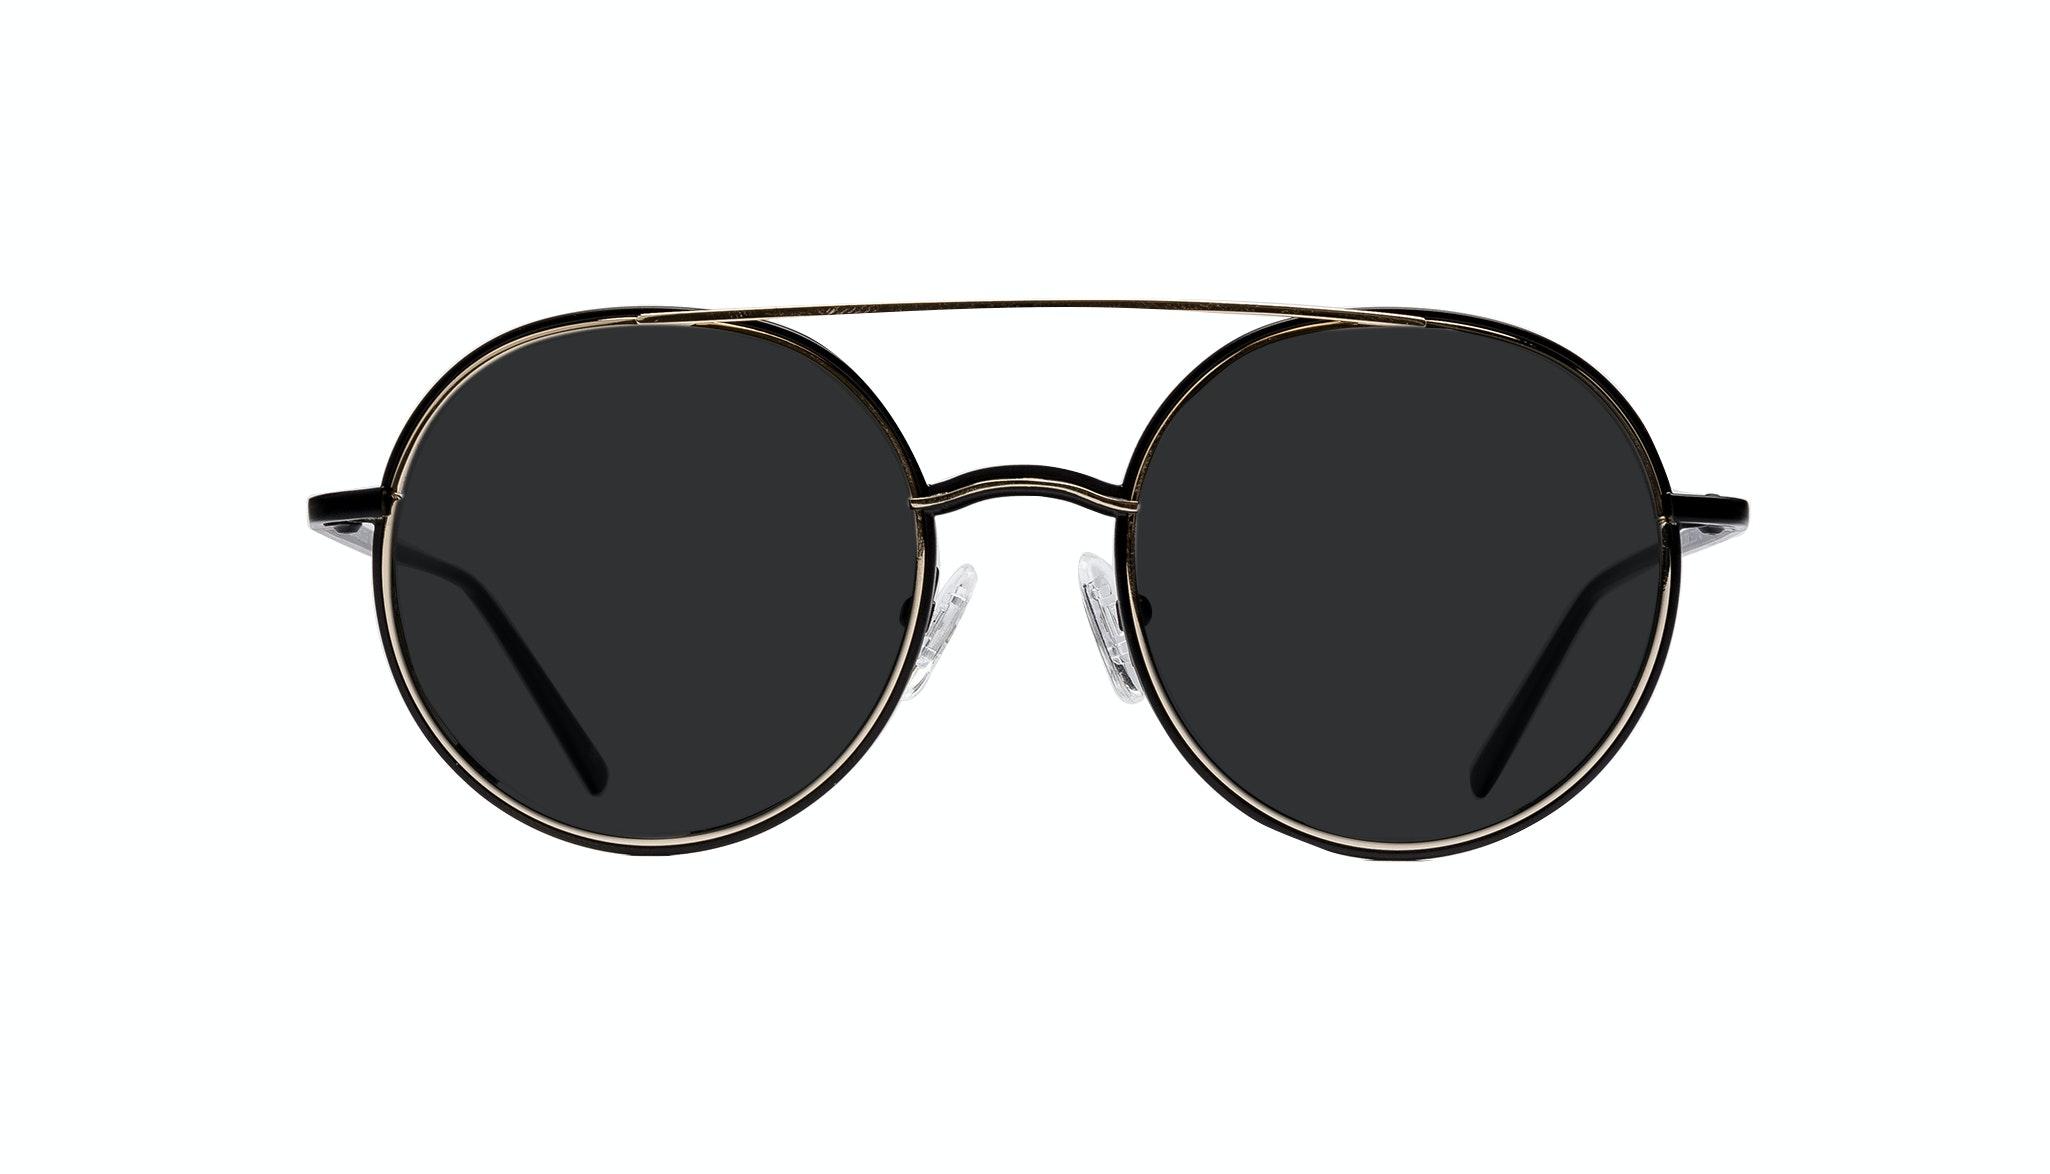 Affordable Fashion Glasses Aviator Sunglasses Women Scarborough Money Bag